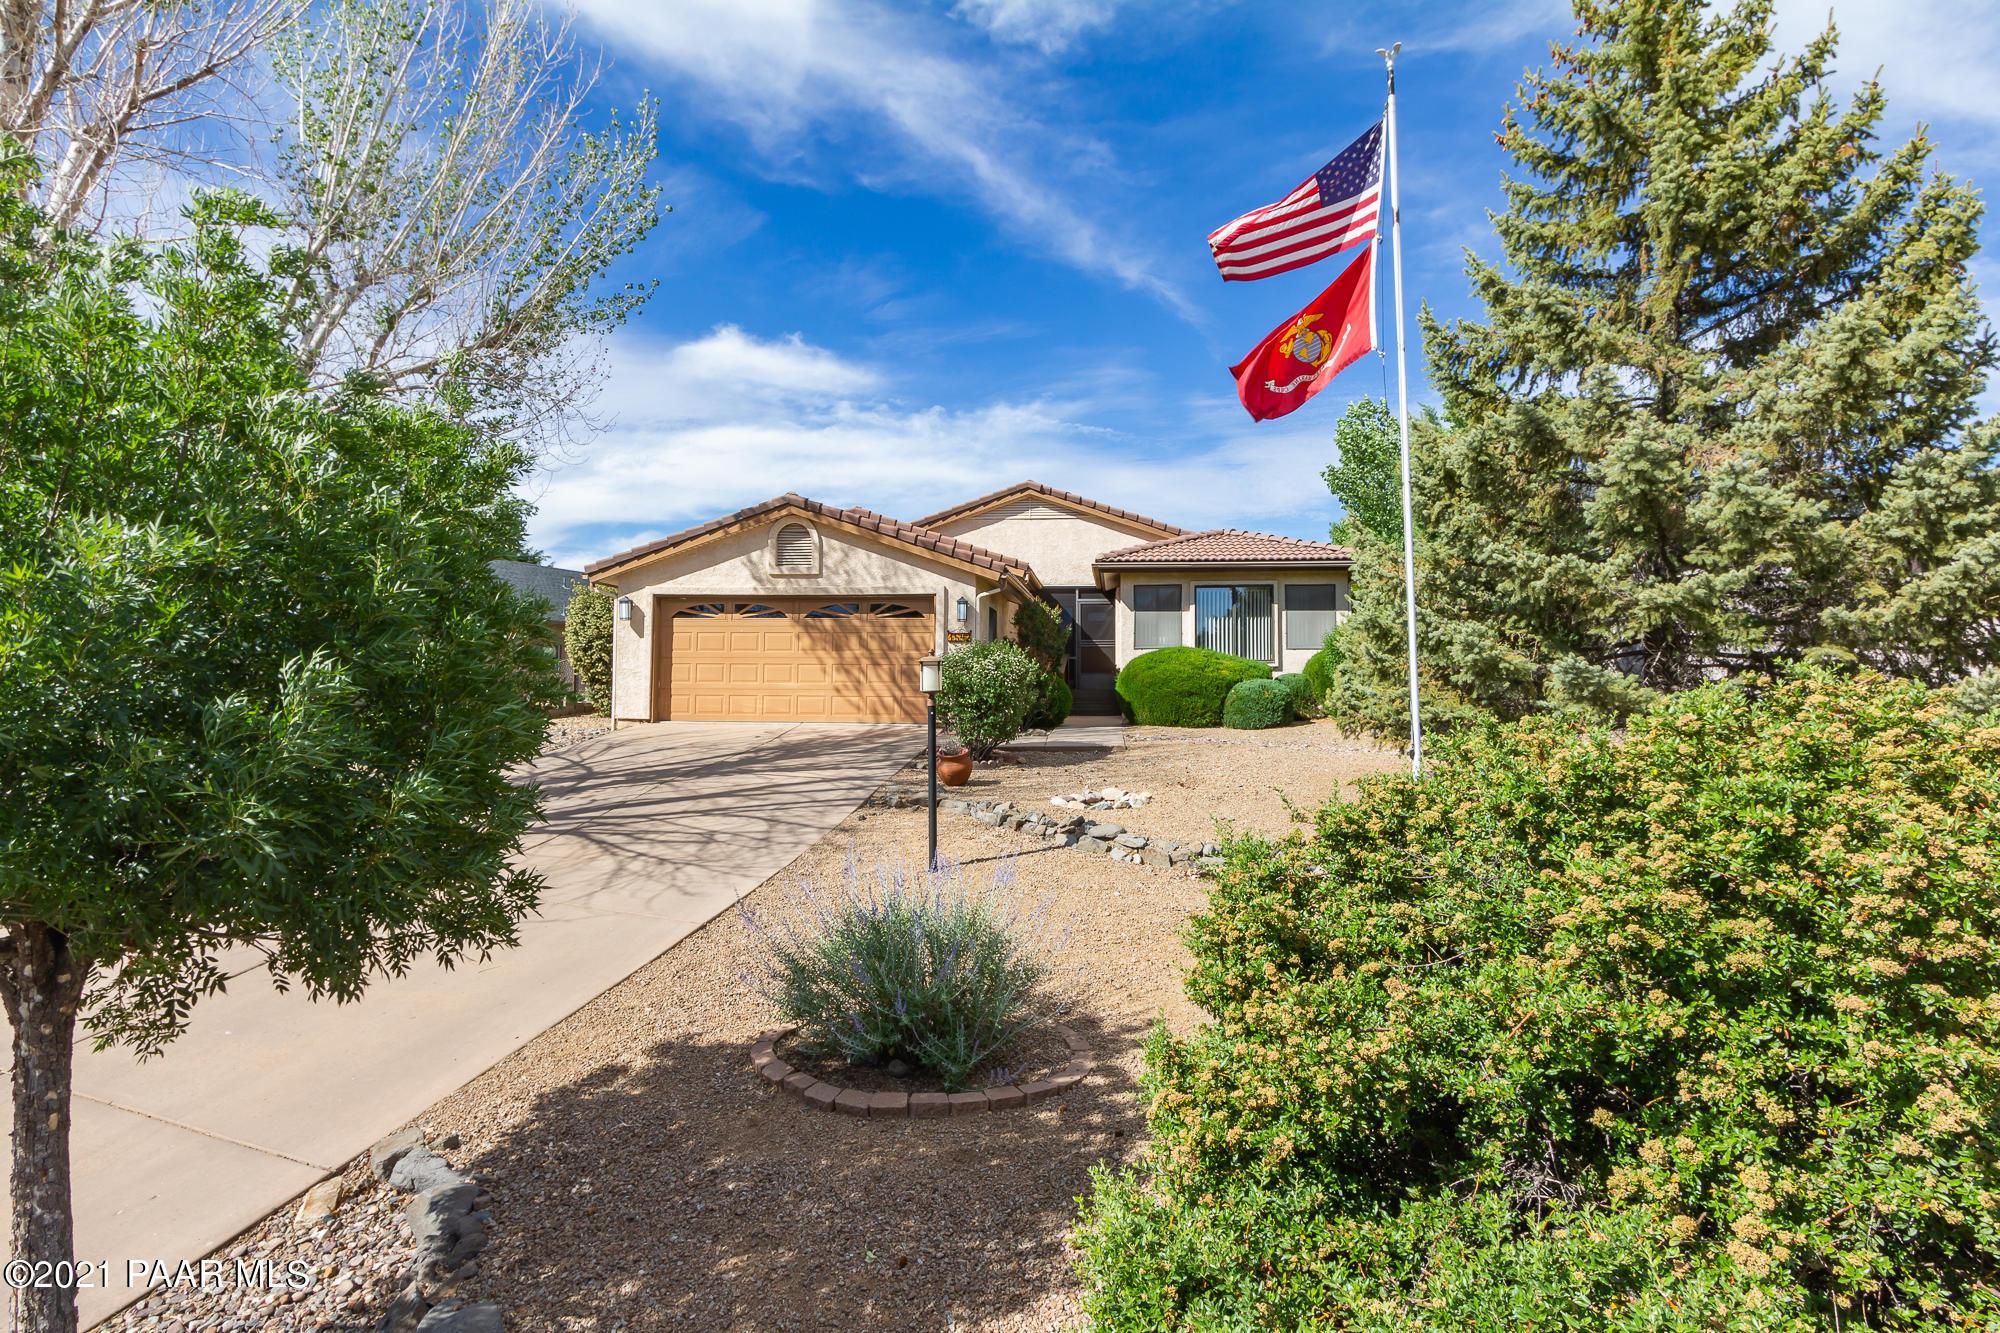 Photo of 1542 Marvin Gardens, Prescott, AZ 86301